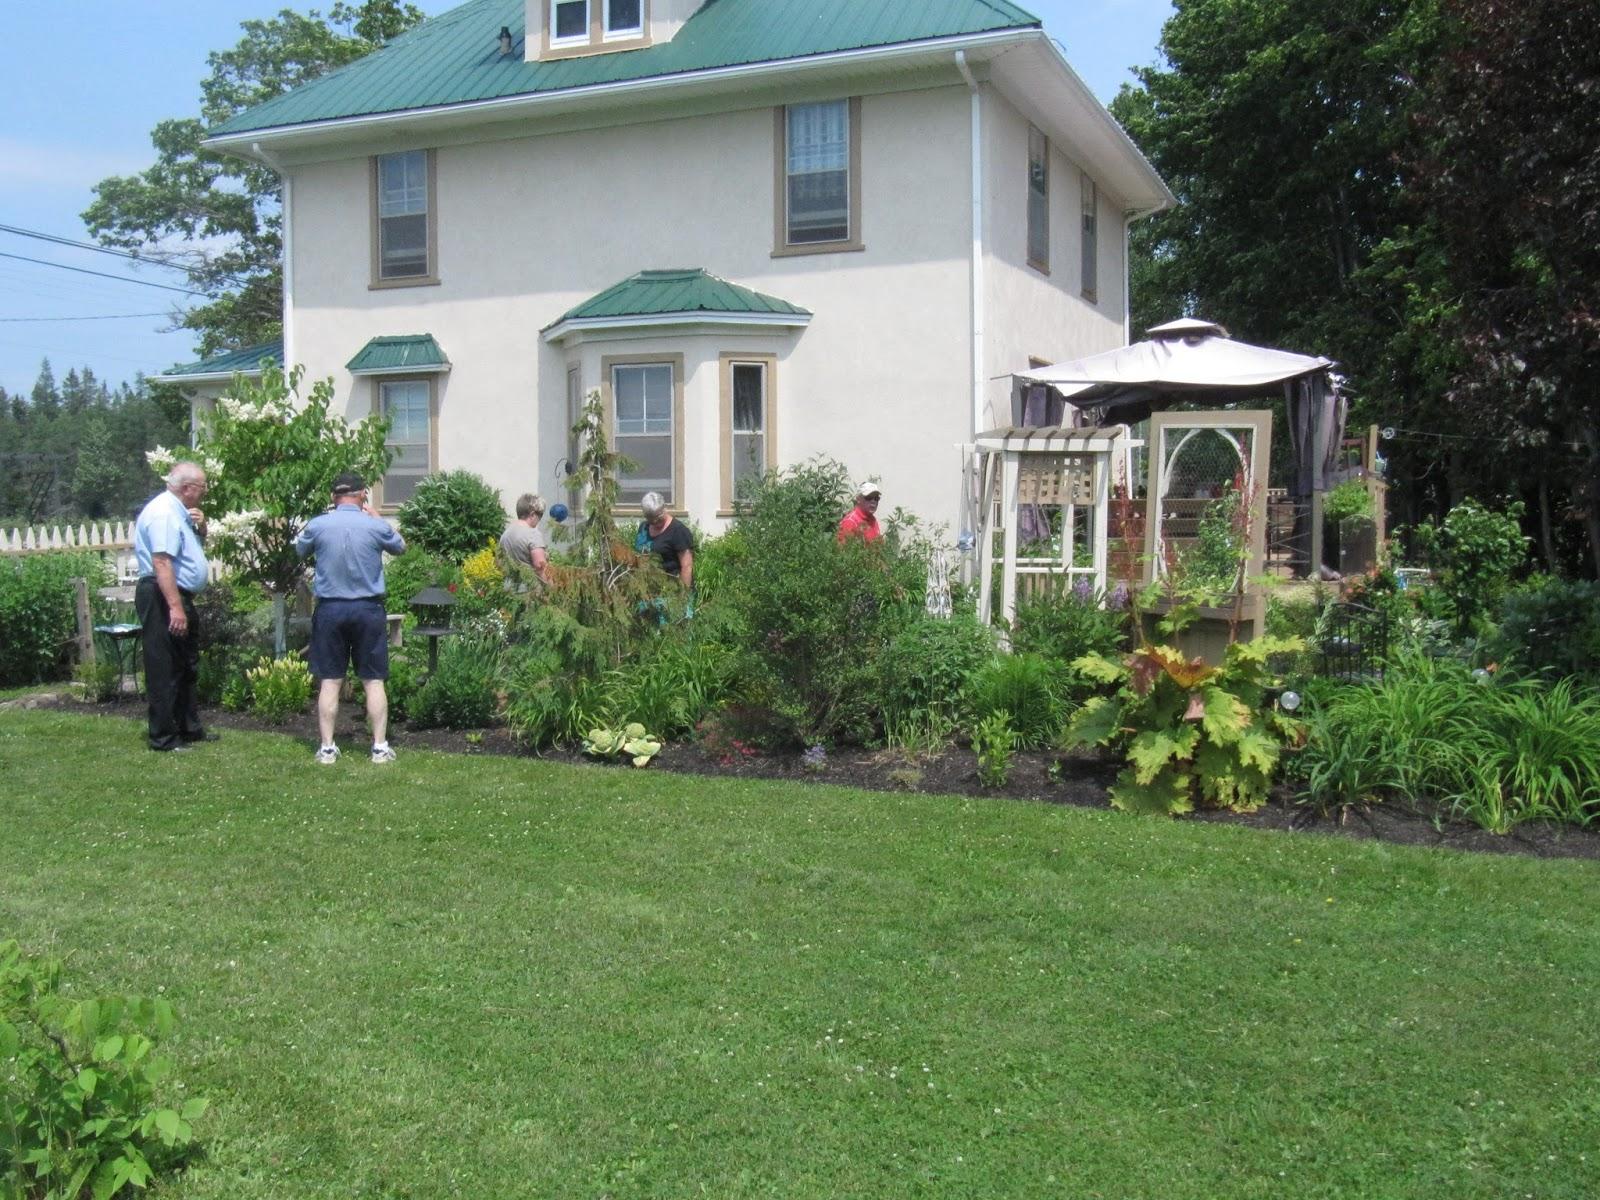 Garden Club of PEI: Garden tours 2015